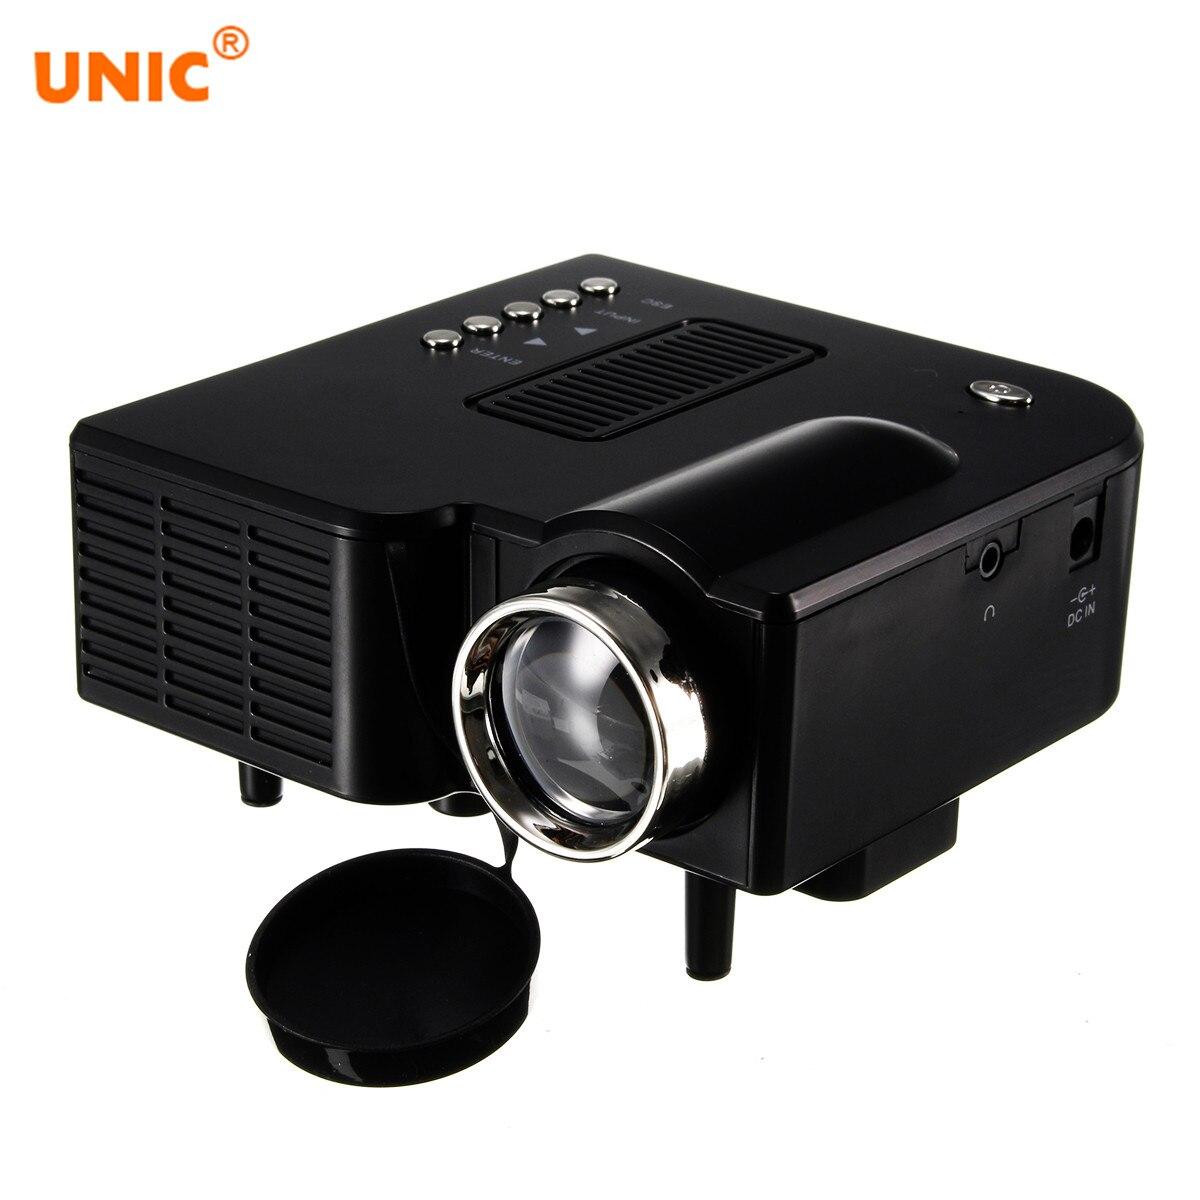 UNIC UC28 + Tragbare LED Projektor Kino Theater Mini Projektor USB/SD/AV Eingang Mini Unterhaltung Projektor